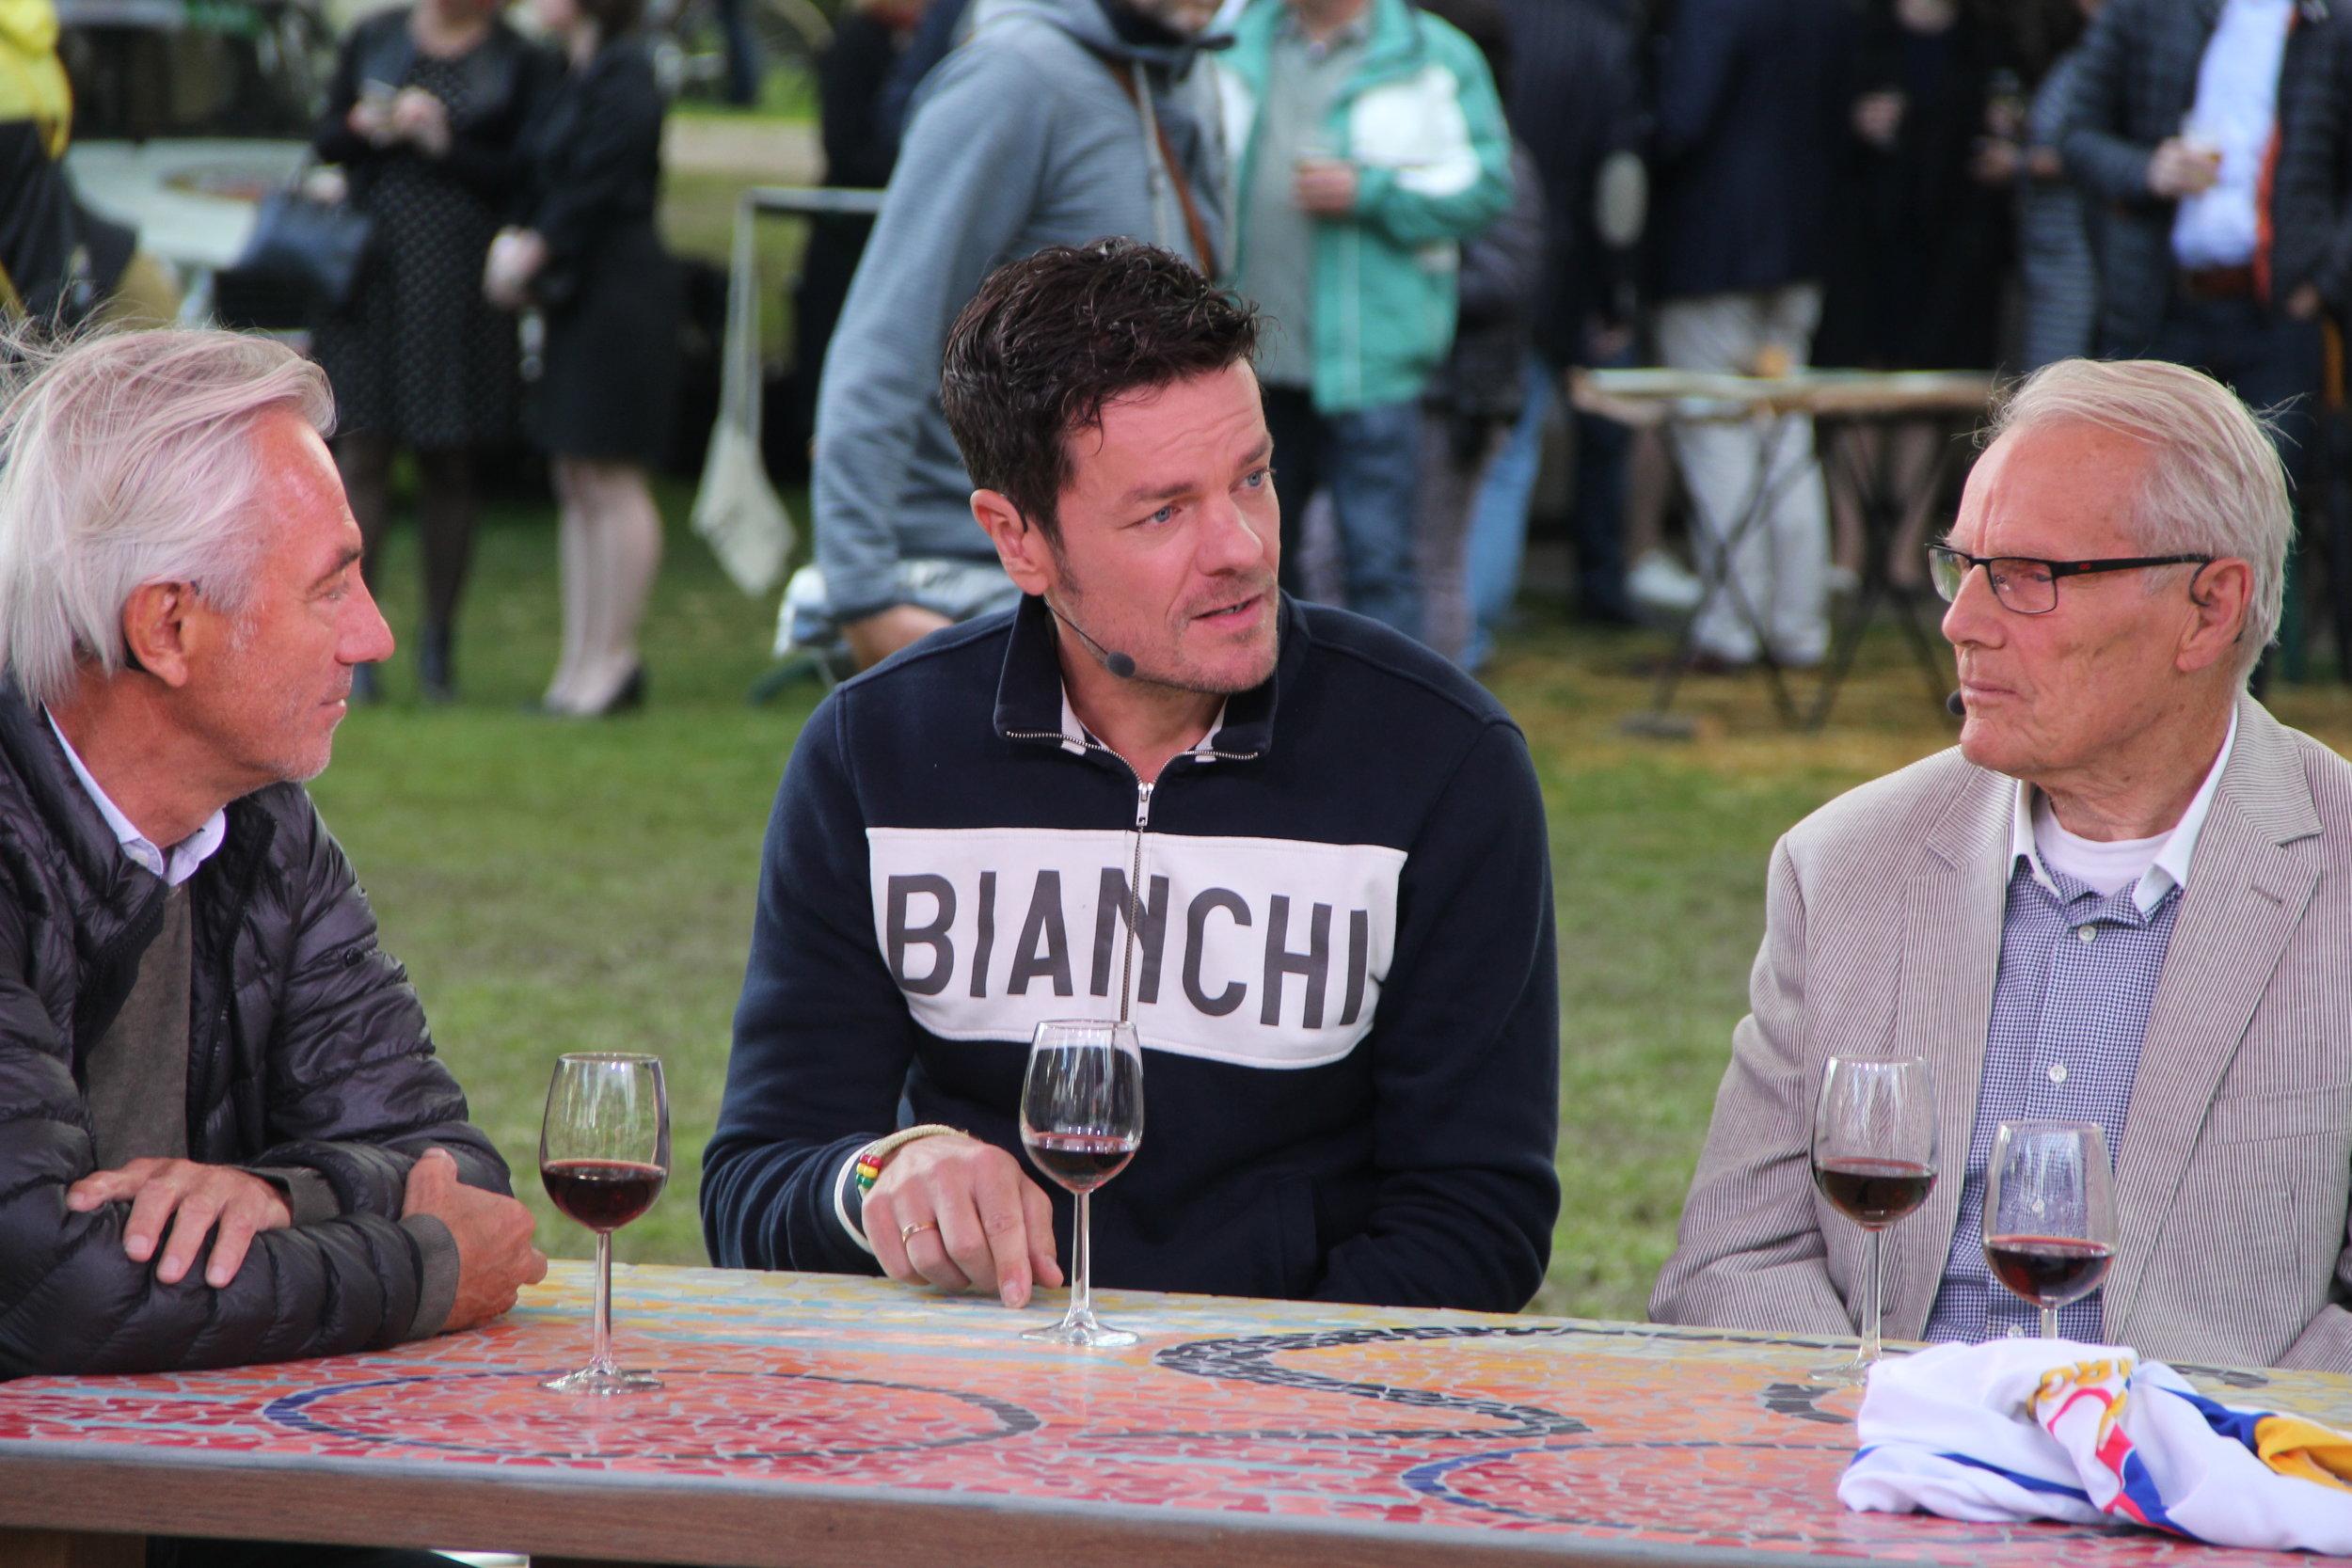 Marc being interviewed on Dutch TV at Eroica Limburg with former Dutch Football manager Bert van Marwijkand and Olympic cyclist Jan Jannsen